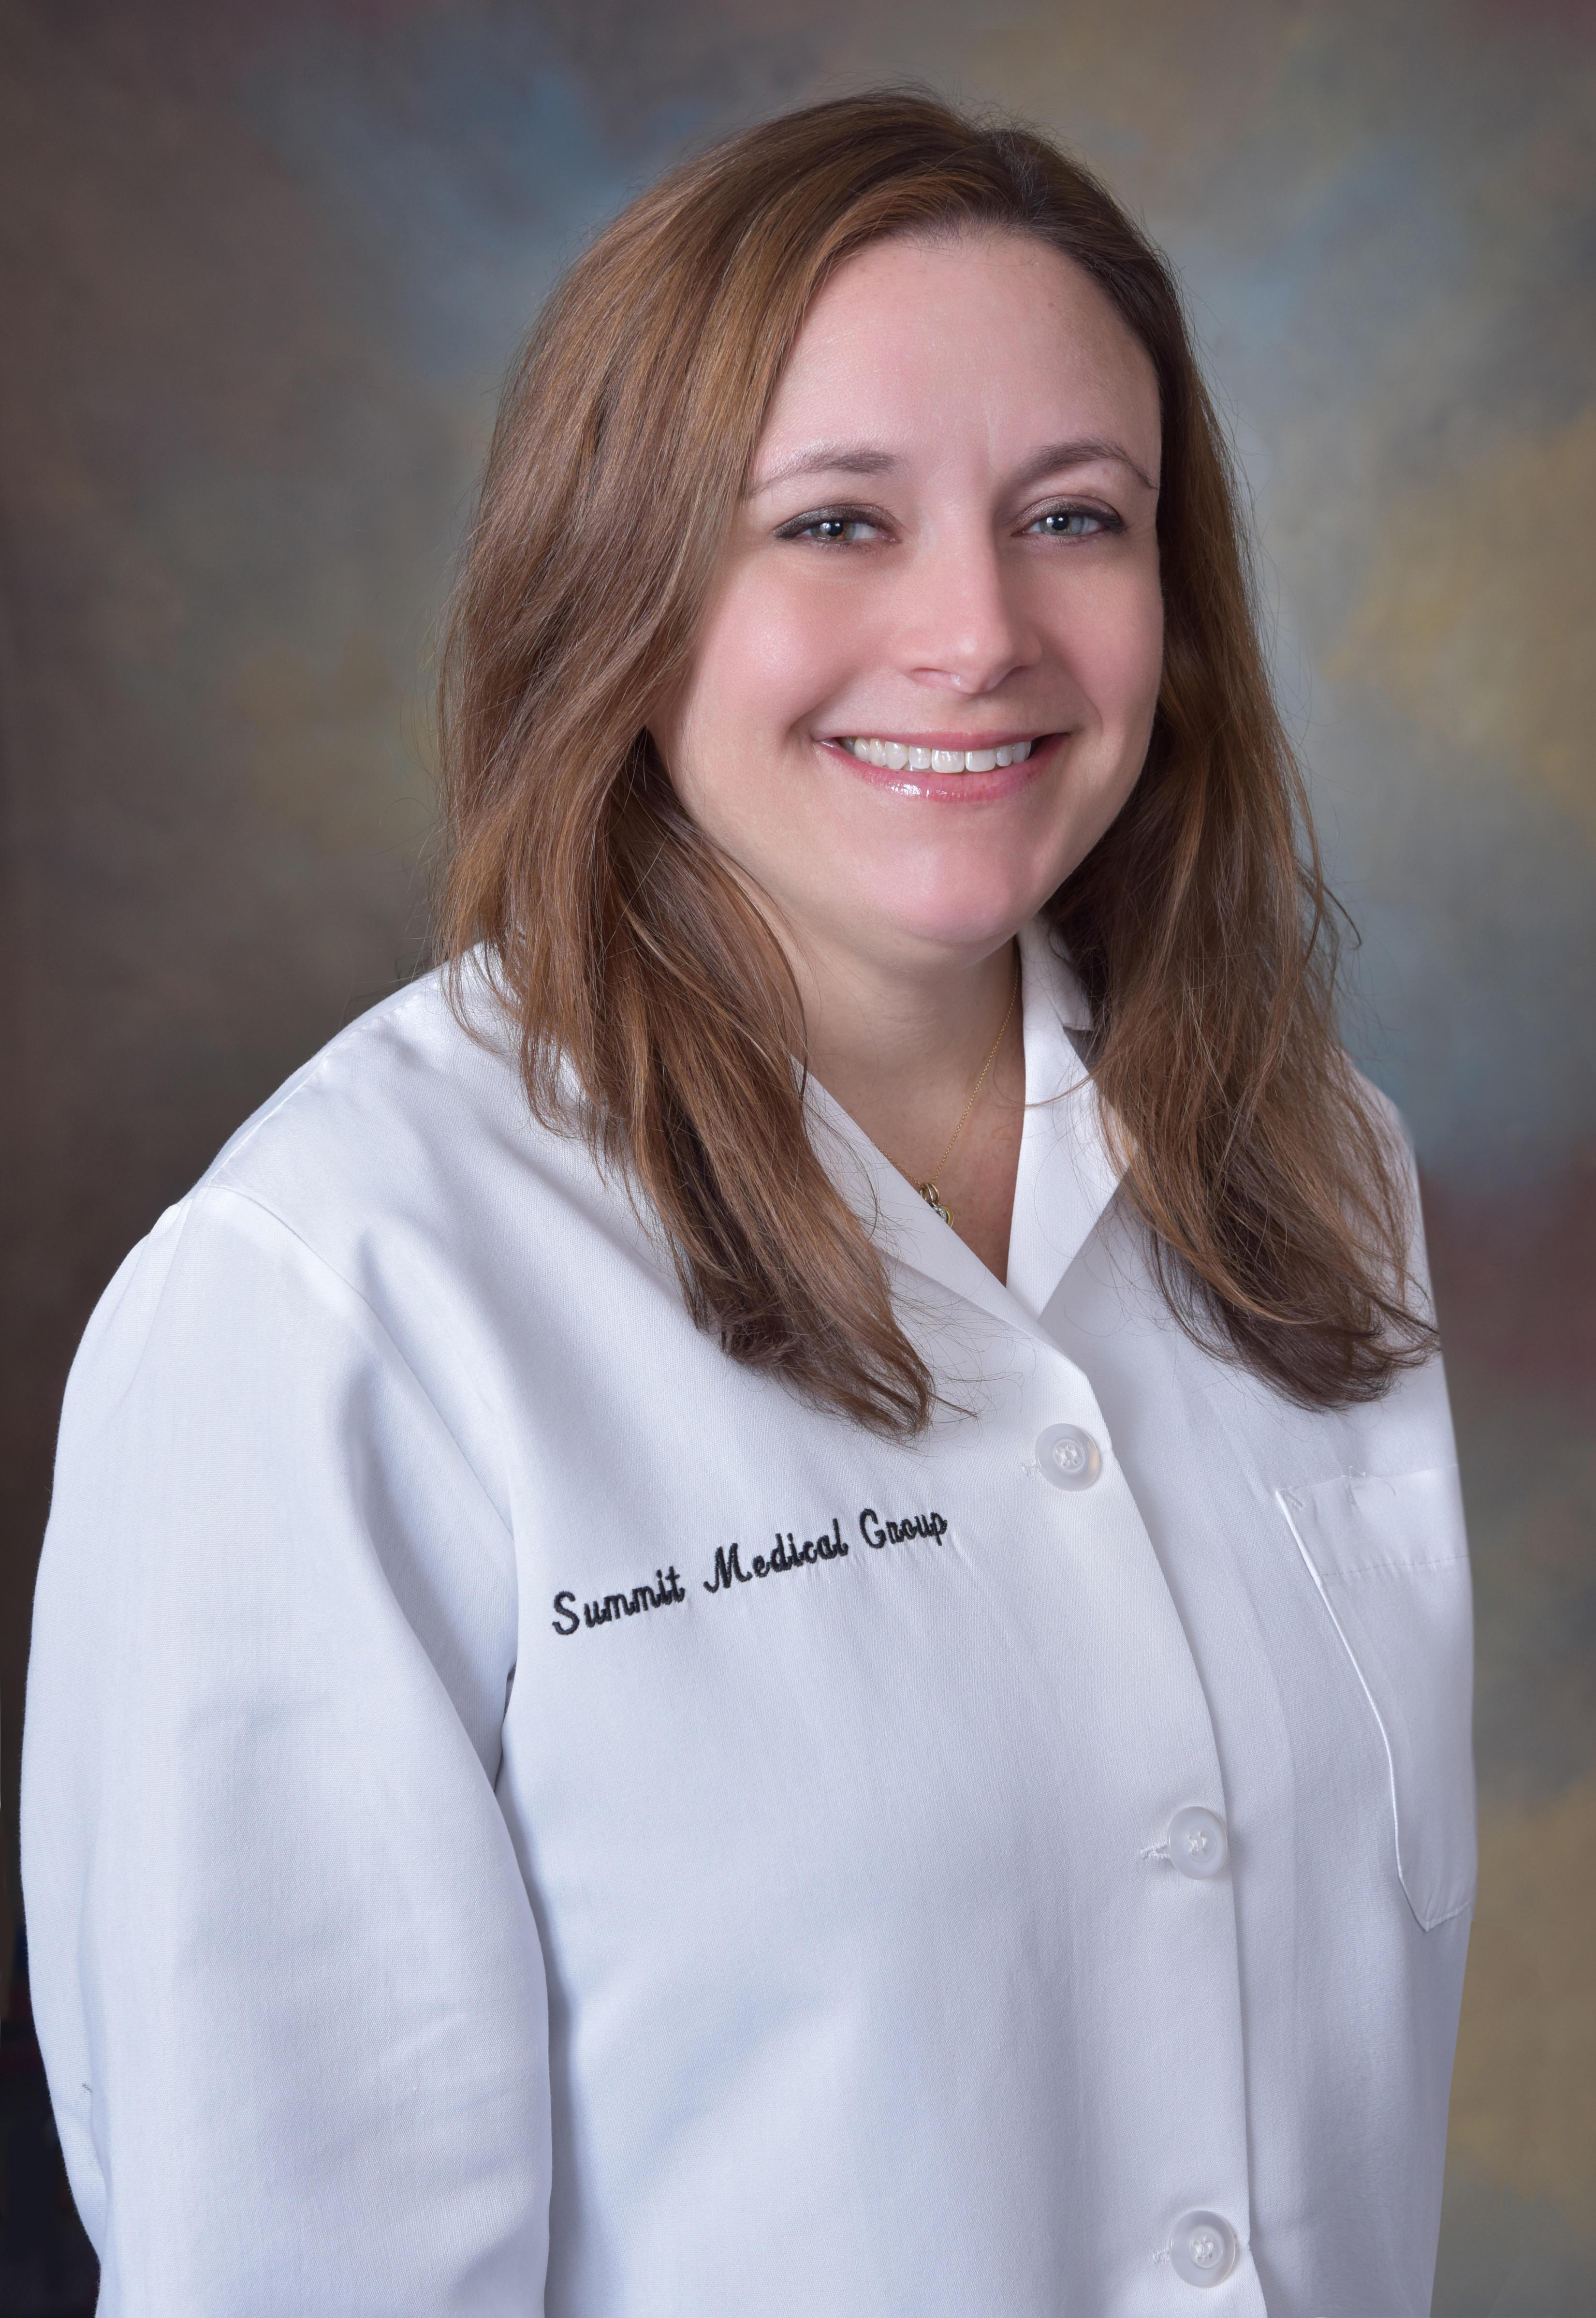 Jennifer Sivitz, MD